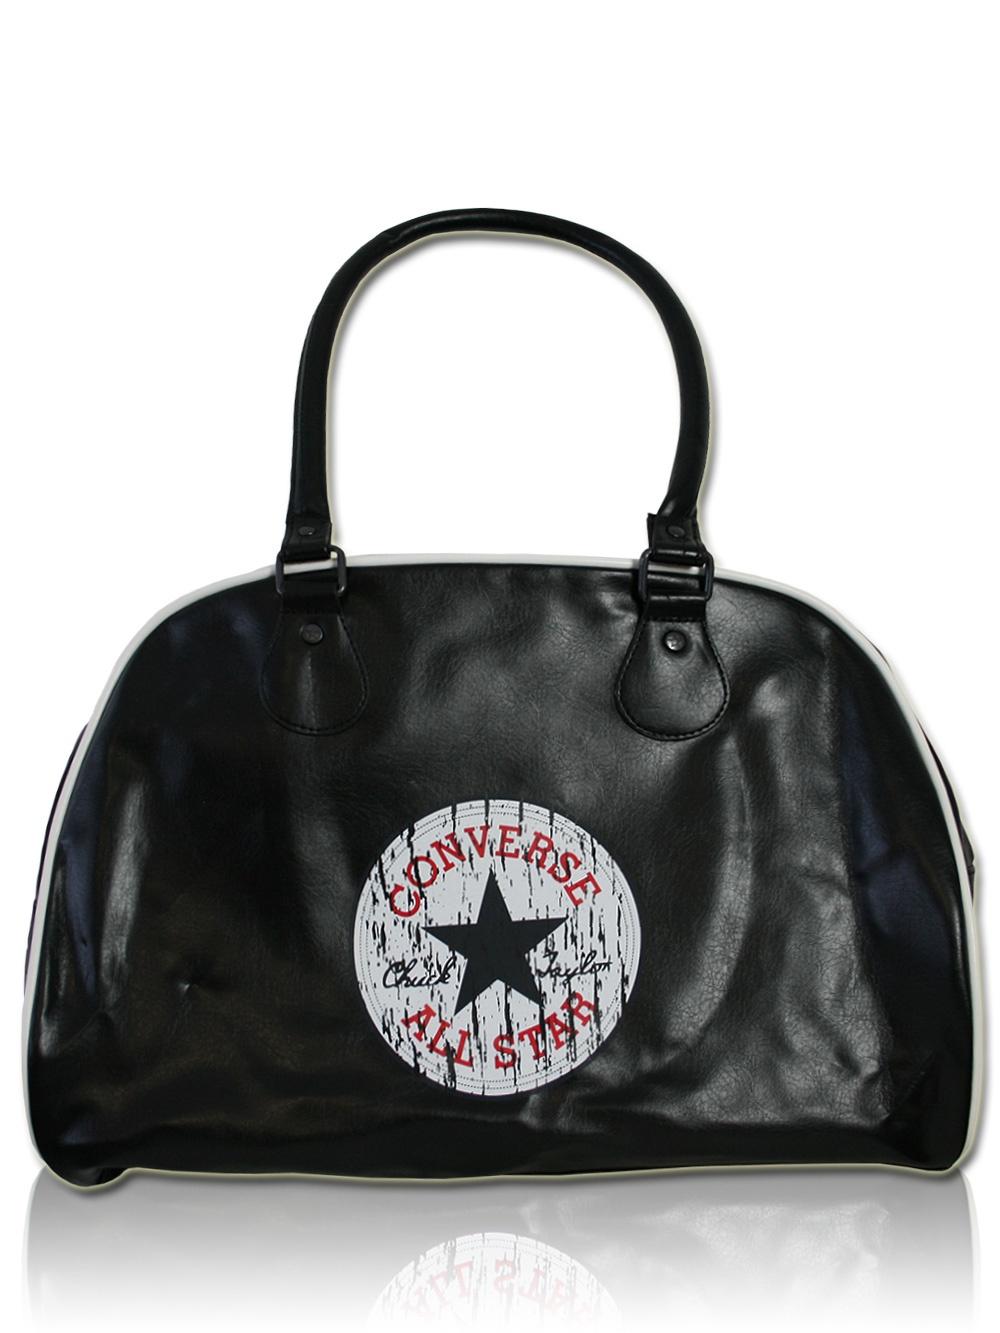 converse damen tasche big sports bag converse 5950. Black Bedroom Furniture Sets. Home Design Ideas